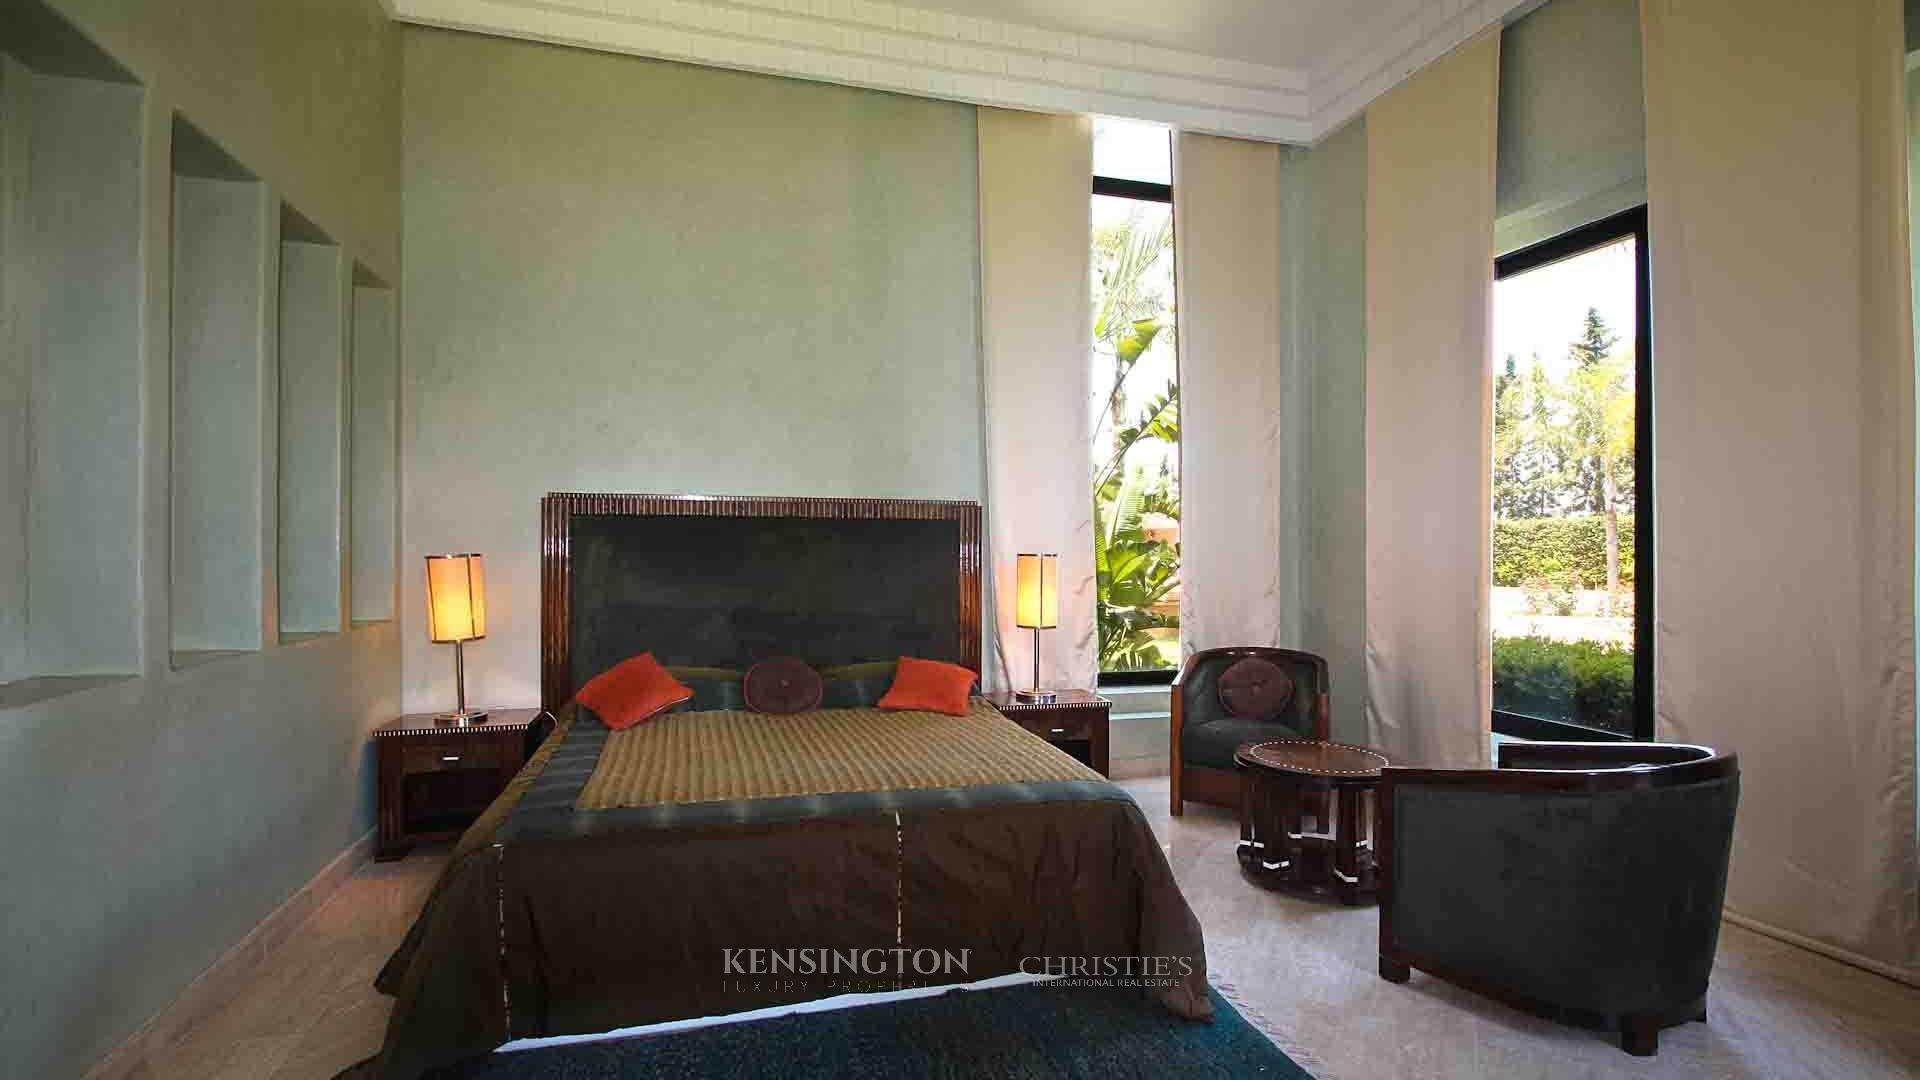 KPPM01065: Villa Julia Luxury Villa Marrakech Morocco